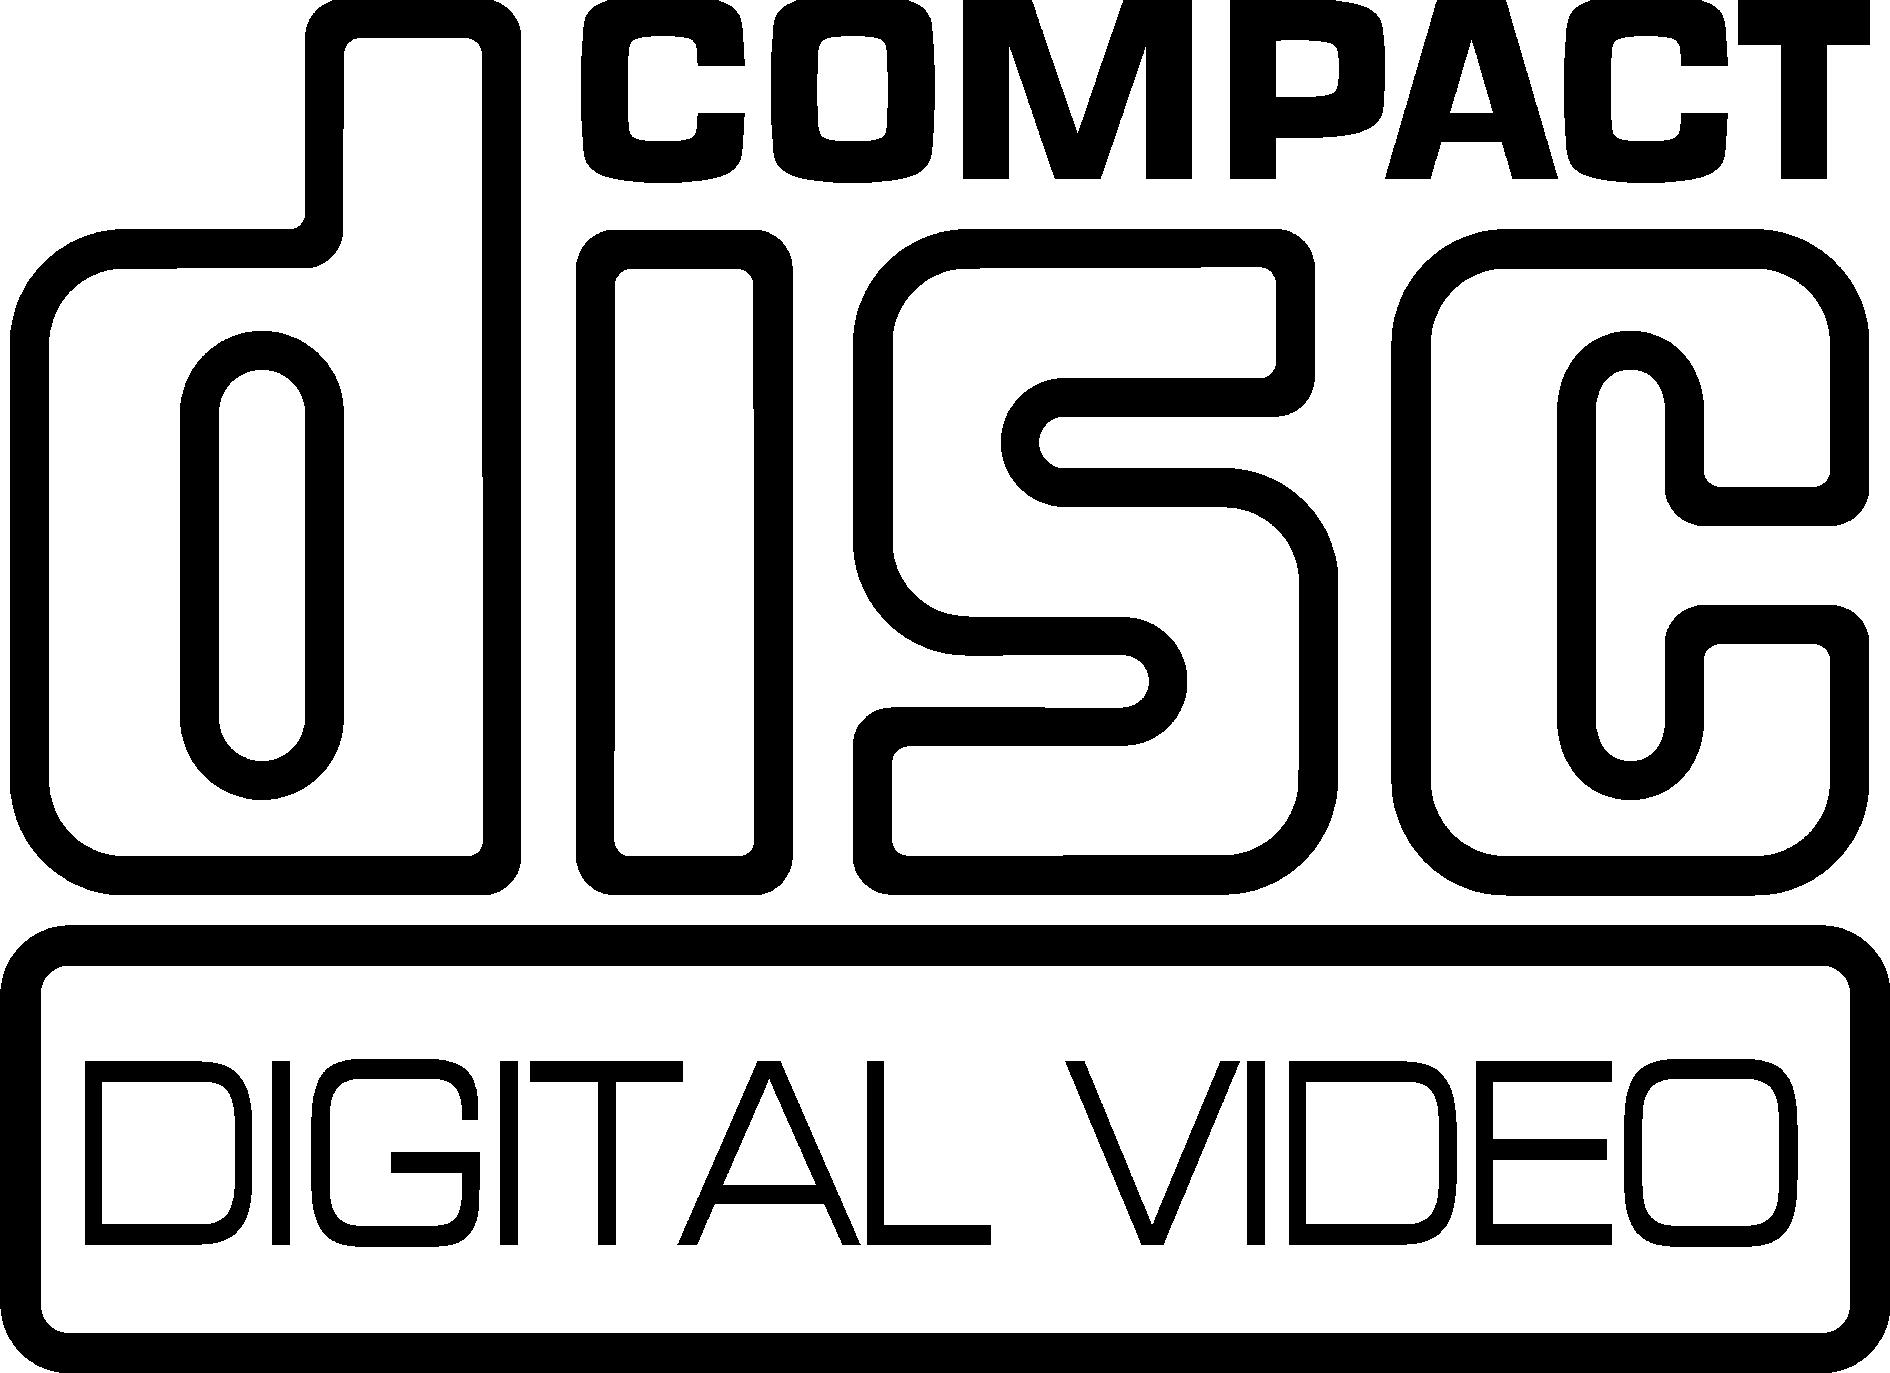 free dvd logo clip art - photo #29